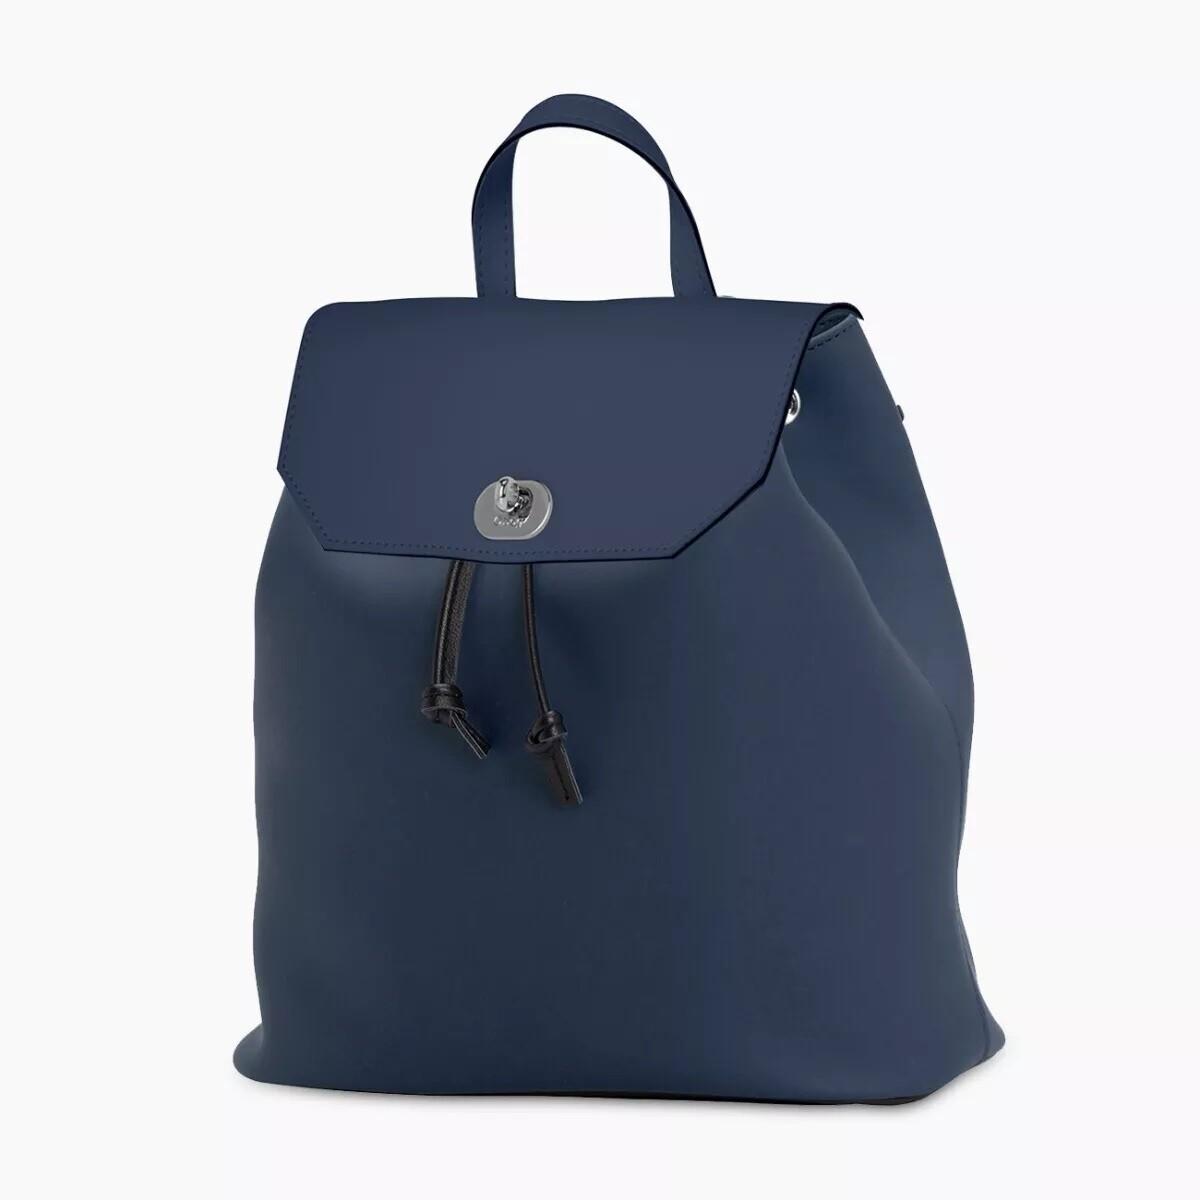 Zainetto O'bag blu.